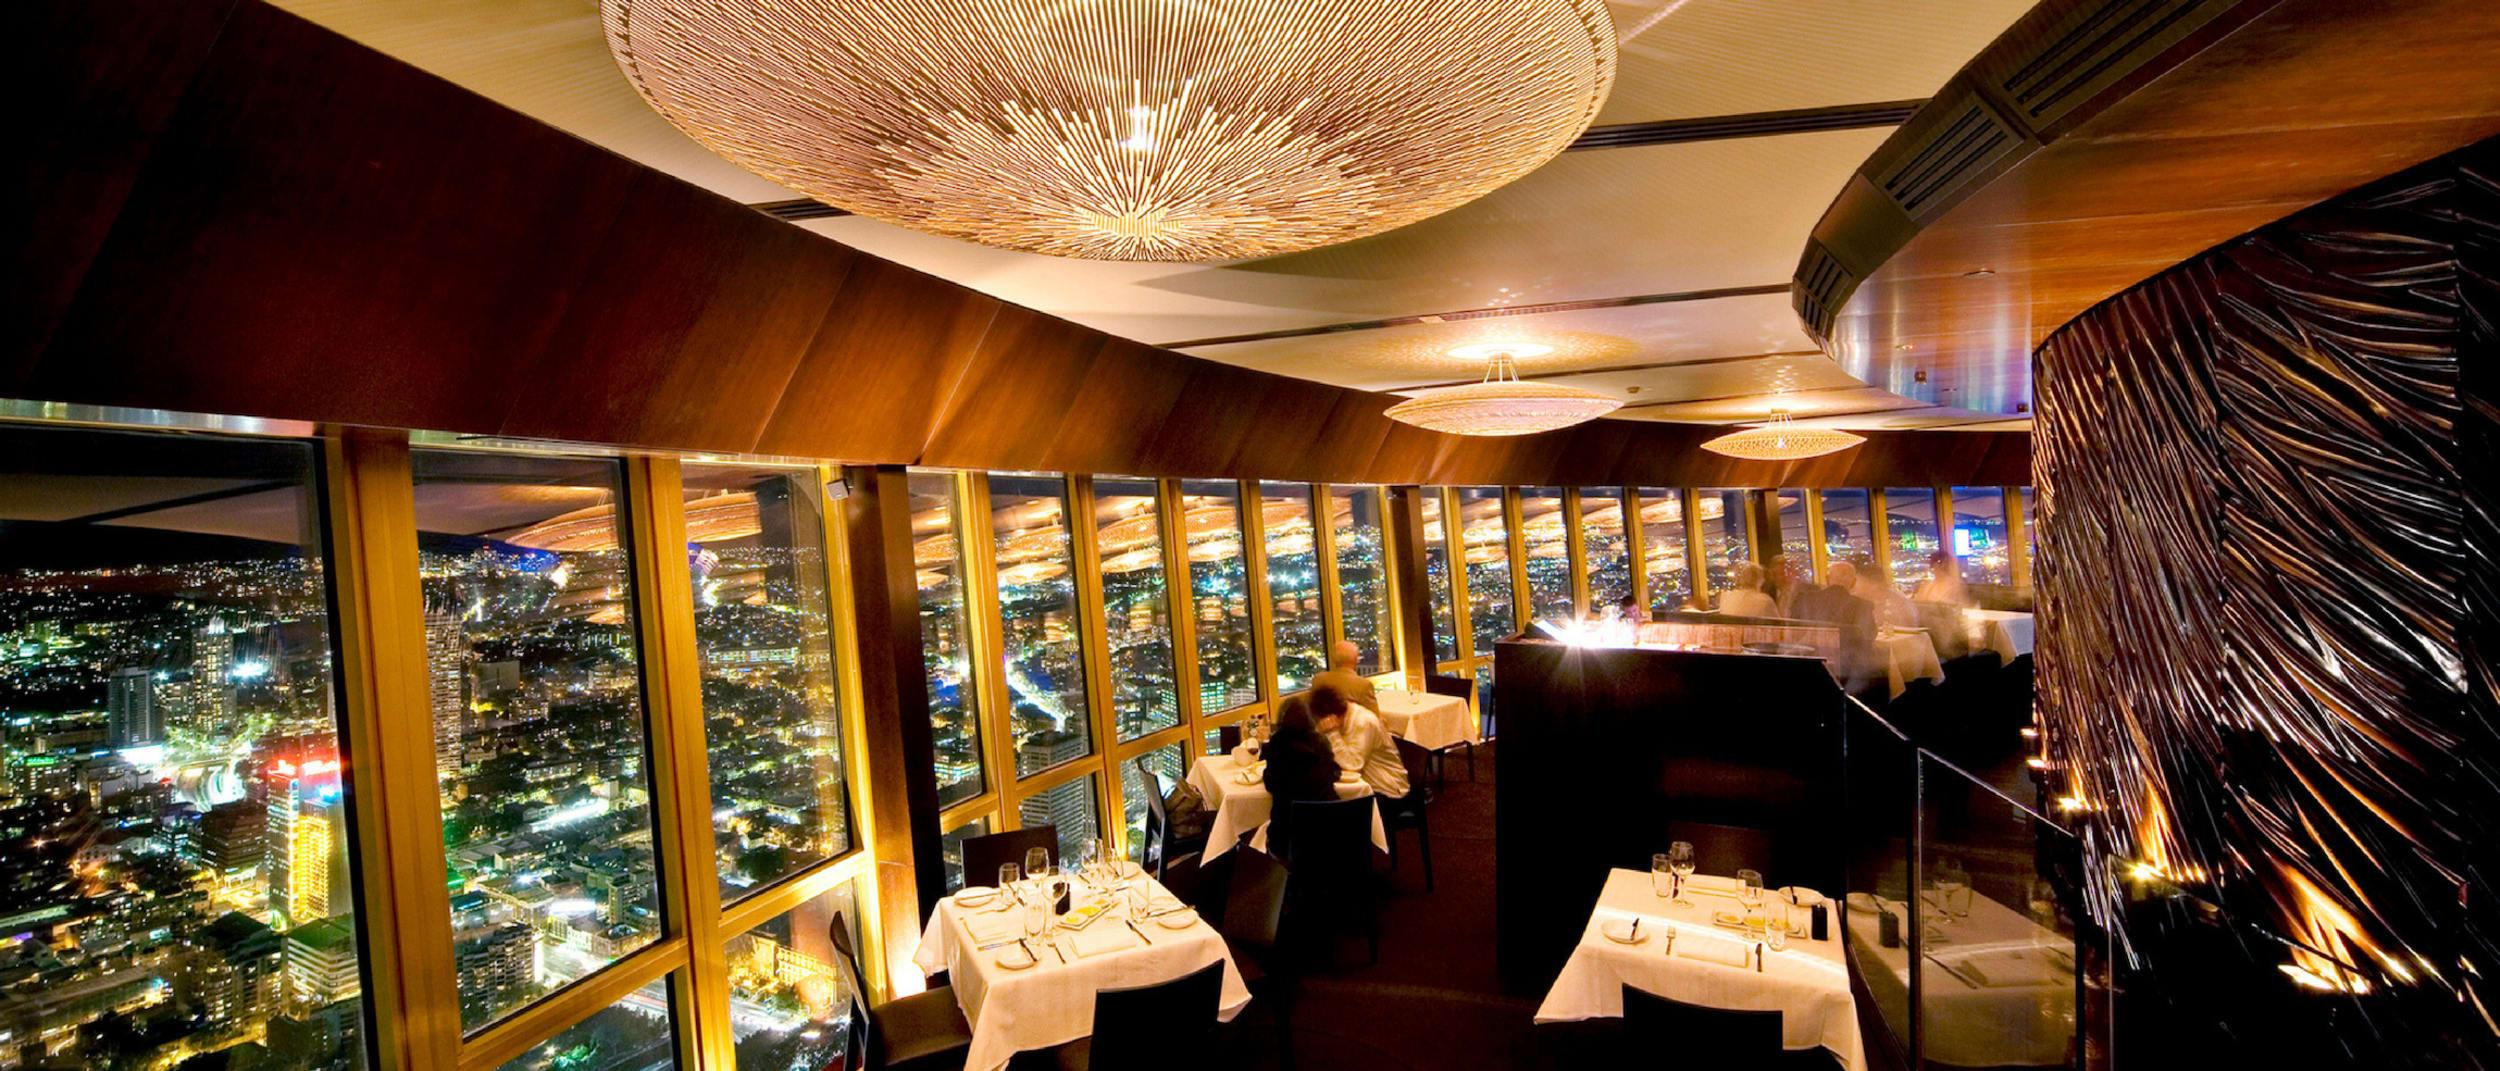 360 Bar and Dining: enjoy seasonal dishes